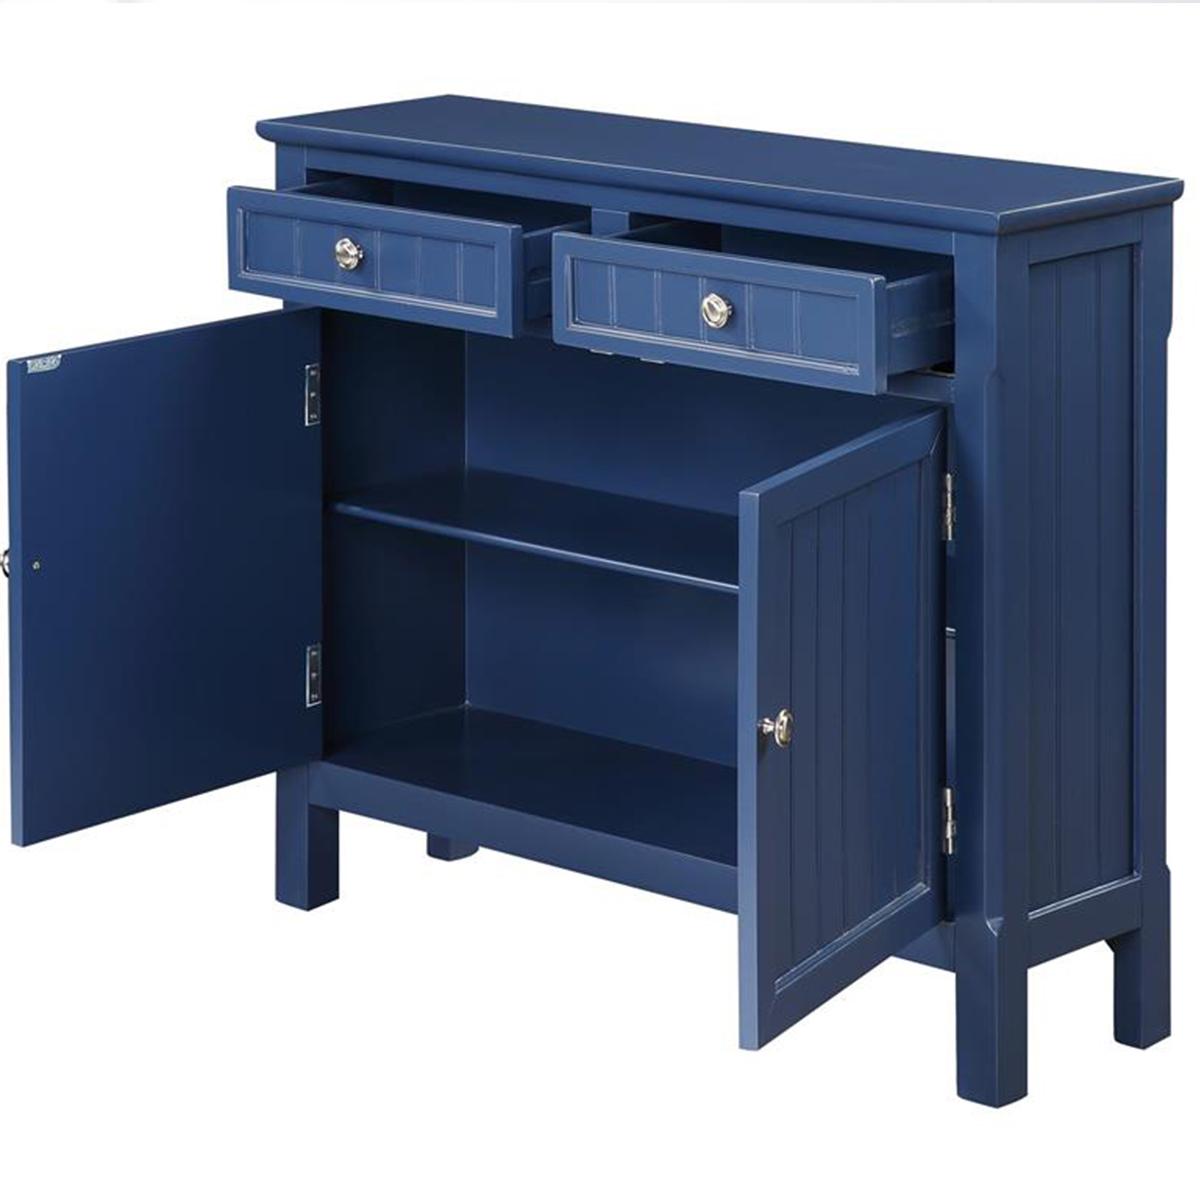 Picture of BLUE 2 DRAWER 2 DOOR CABINET